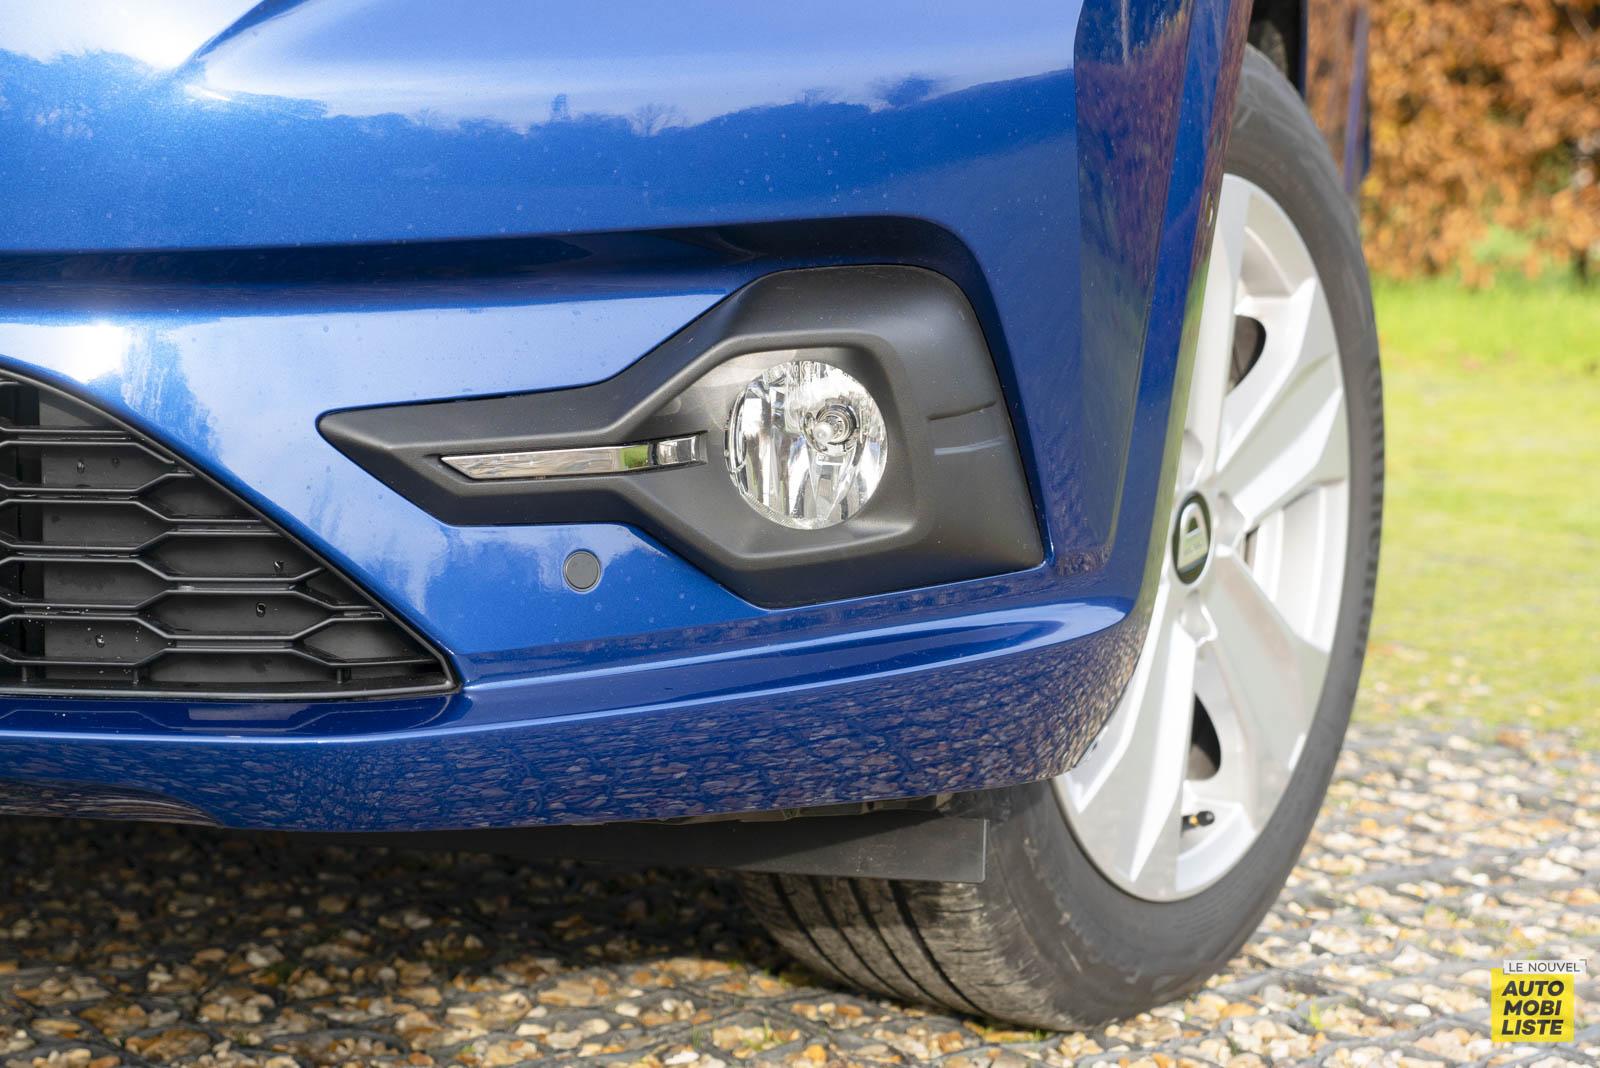 LNA 2011 Dacia Sandero TCe90 Comfort Ecterieur Detail 009